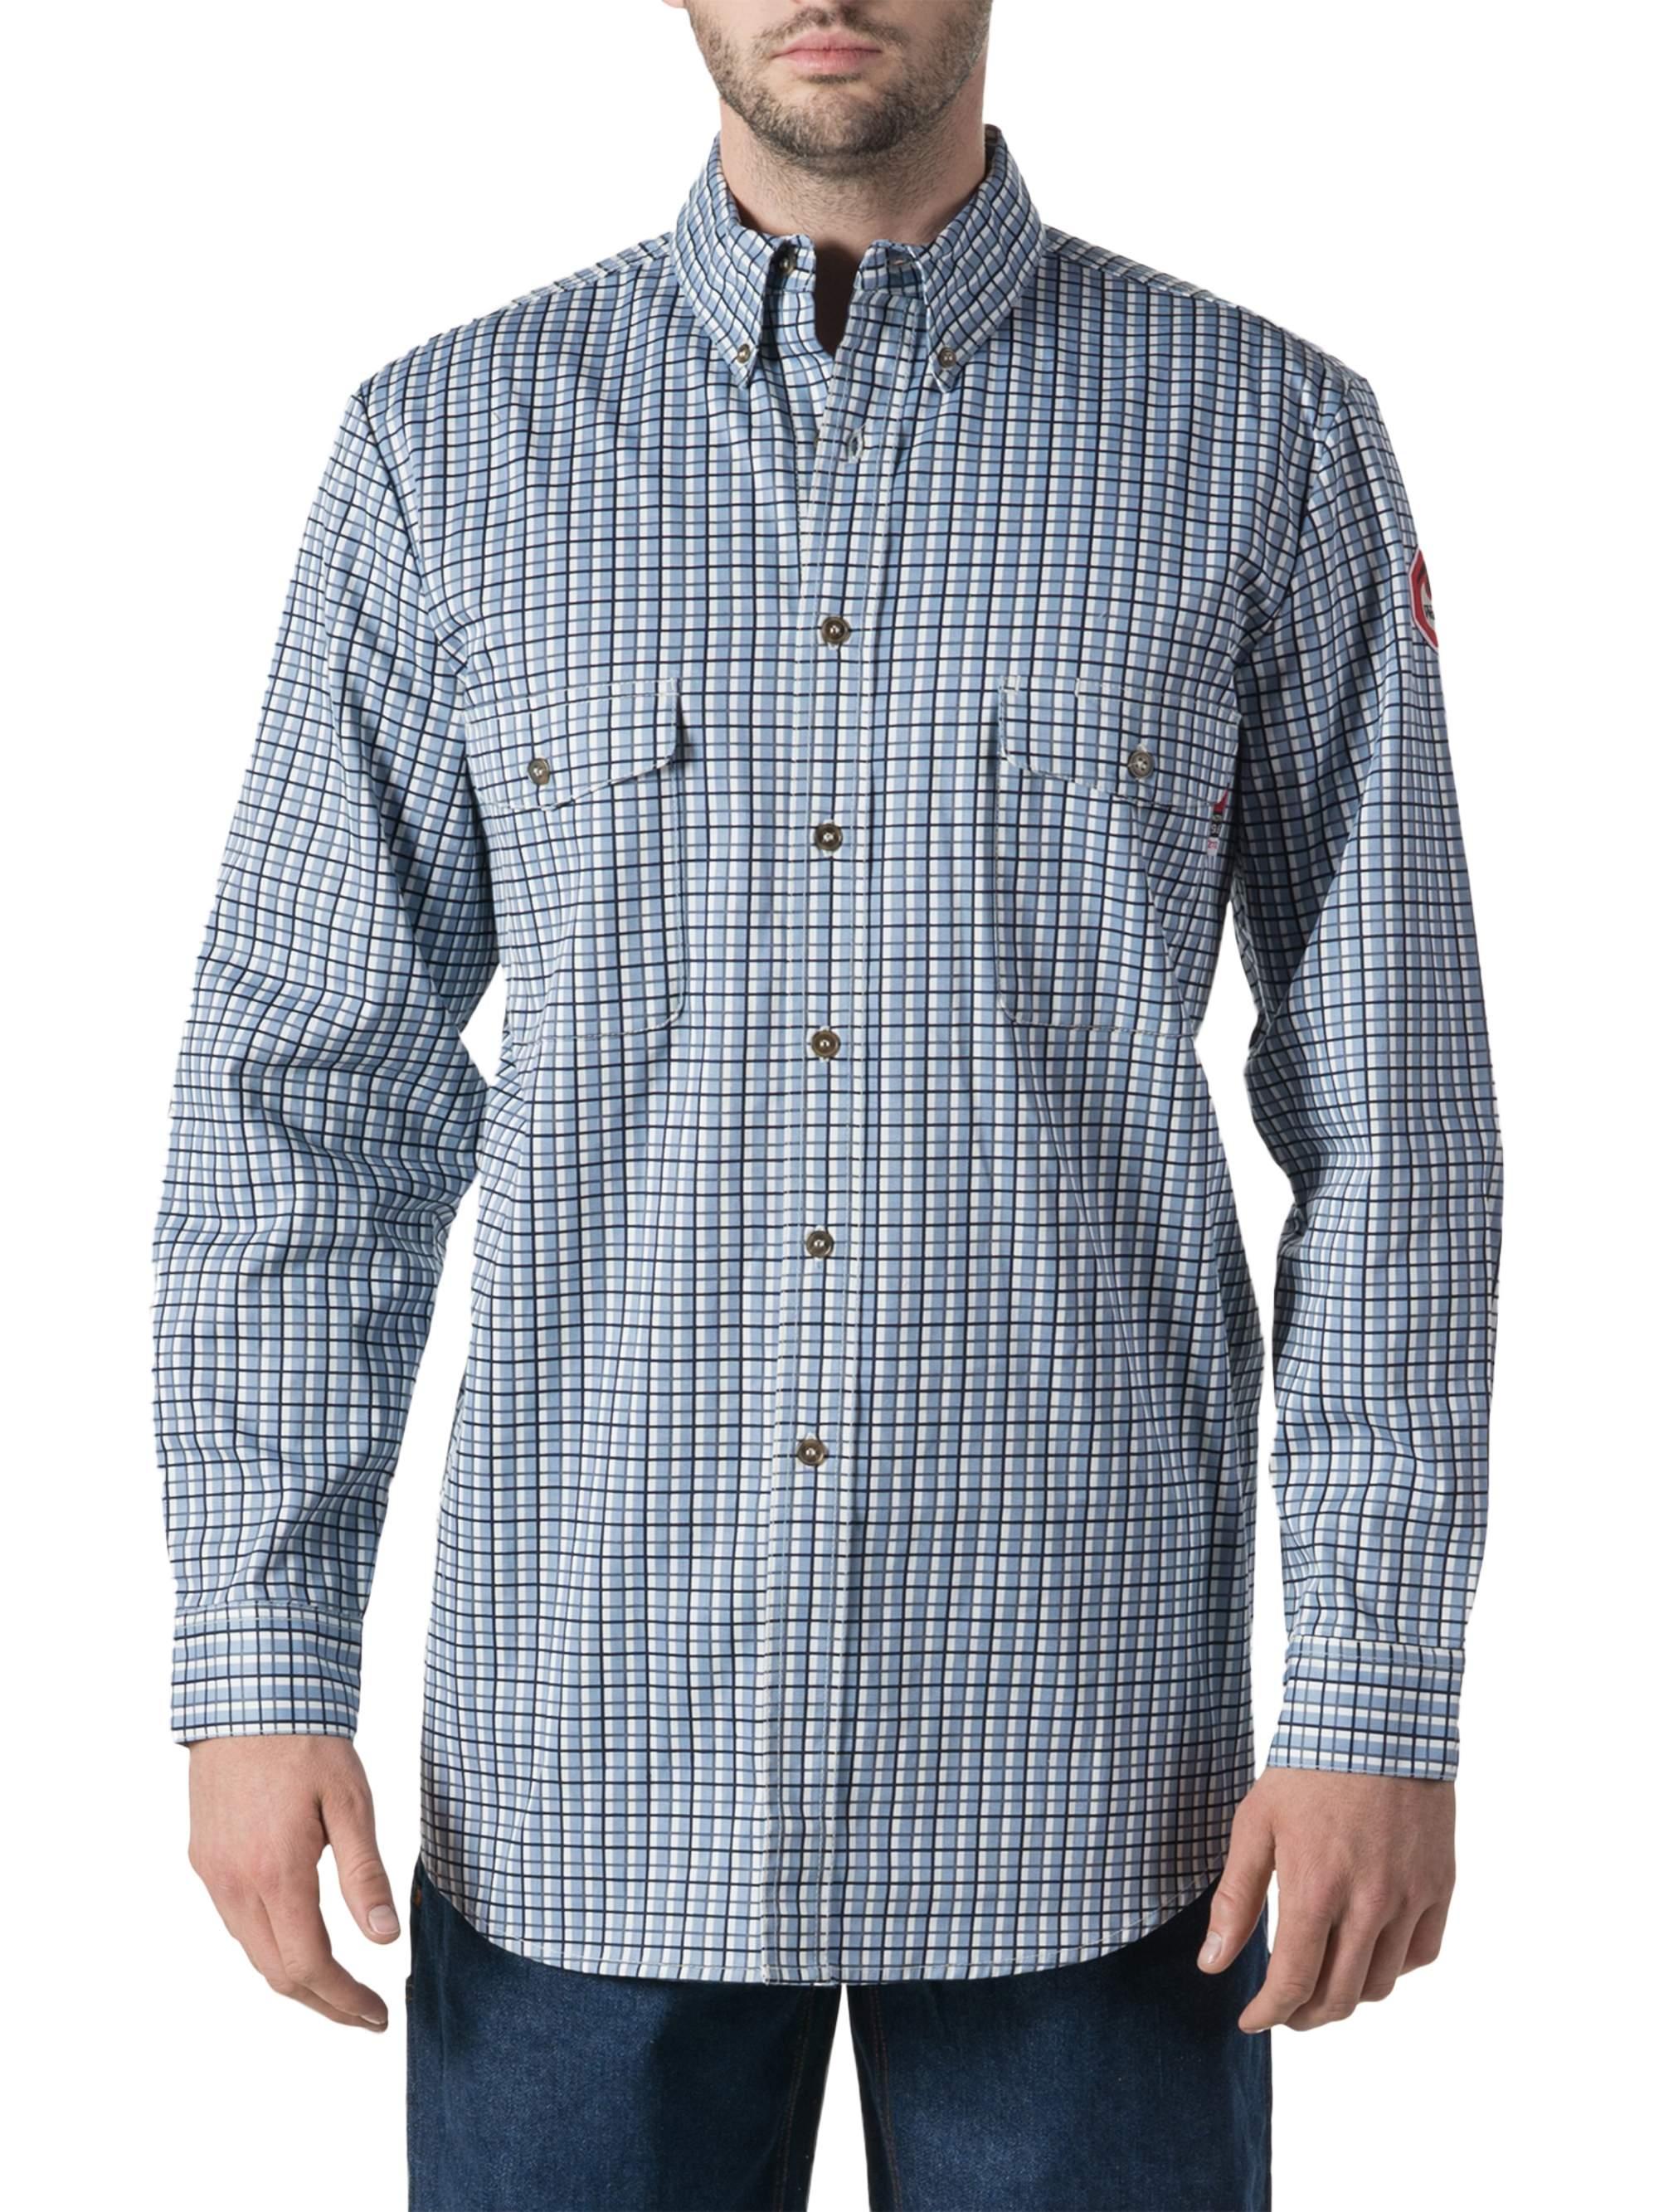 Men's Flame Resistant Plaid Work Shirt, HRC Level 2